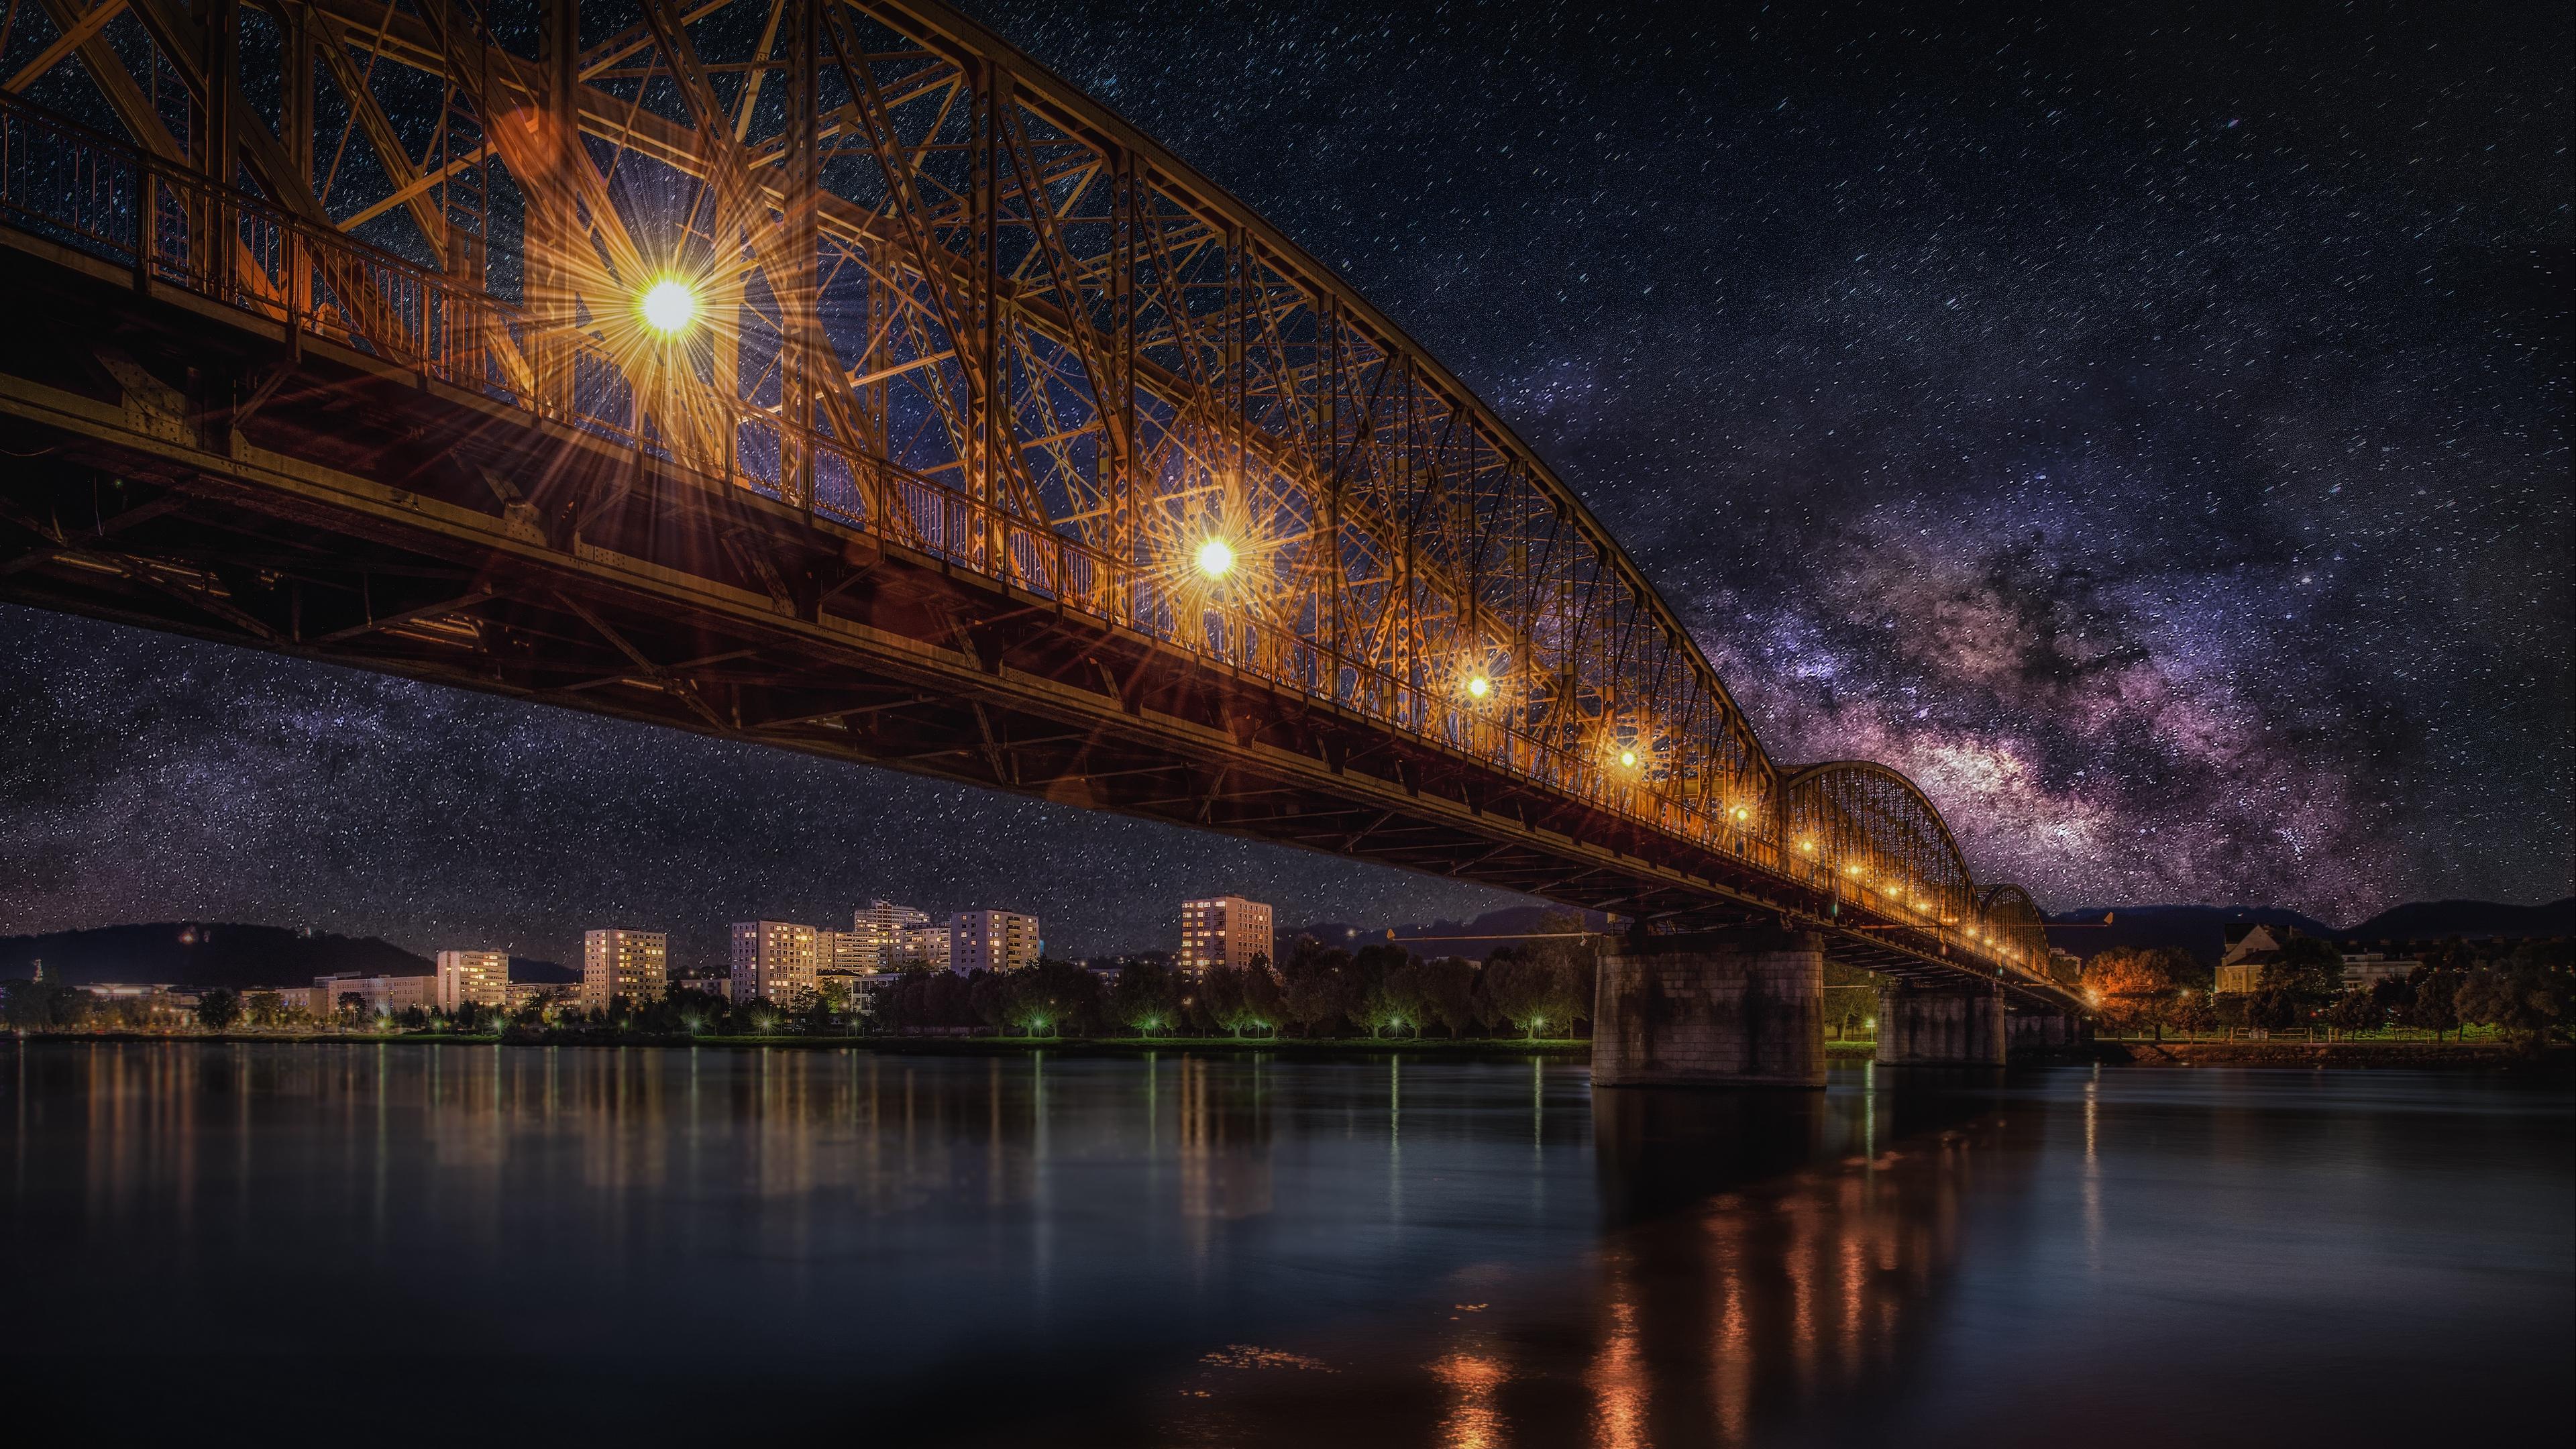 starry sky bridge railway night hdr 4k 1538066633 - starry sky, bridge, railway, night, hdr 4k - starry sky, railway, bridge